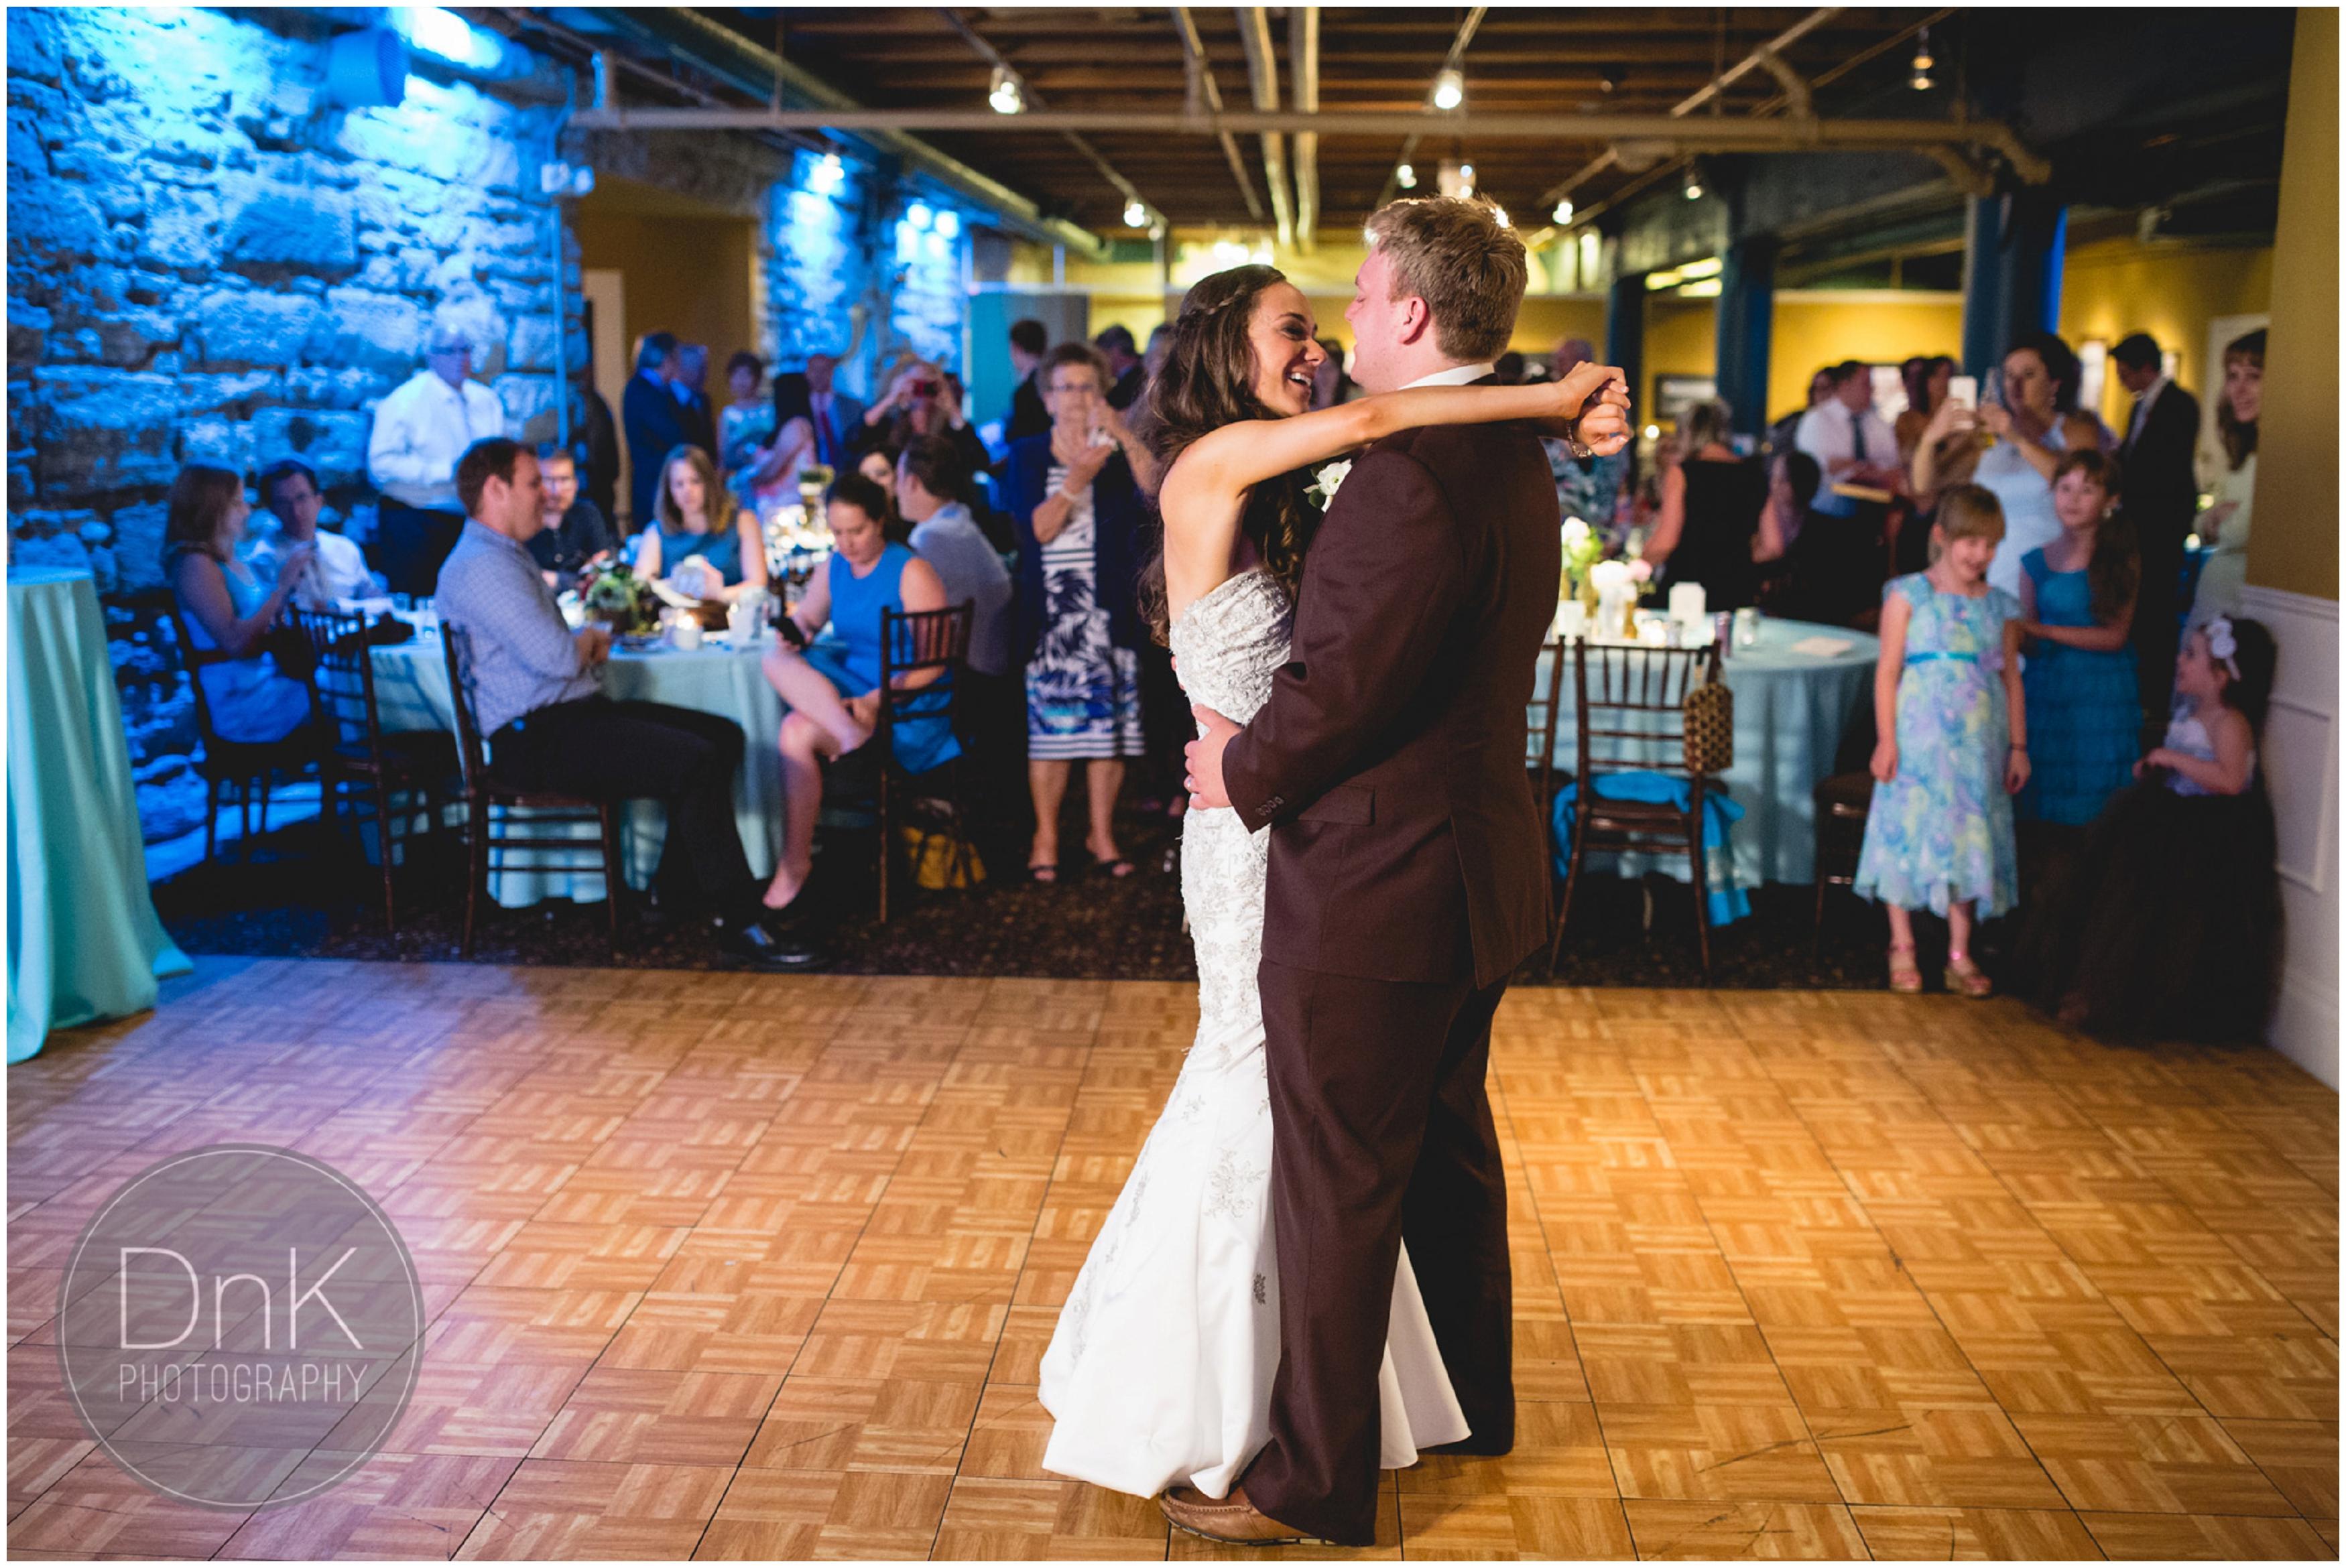 39 - 413 on Wacouta Wedding Reception Dance